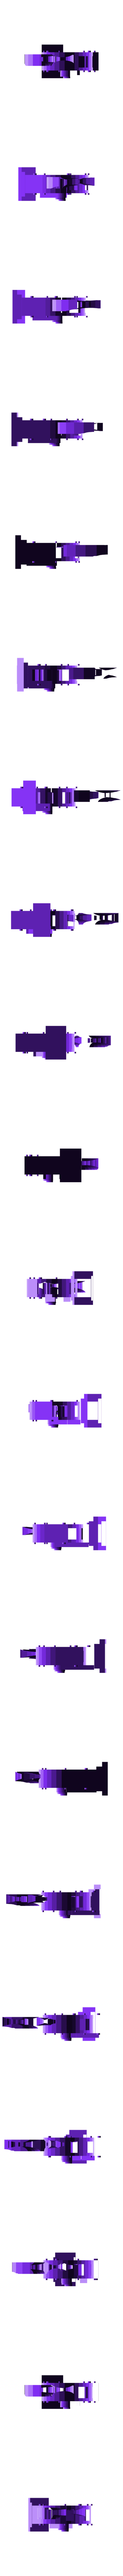 rear_rotor_with_locks.stl Télécharger fichier STL gratuit GyroBomber nain • Objet imprimable en 3D, mrhers2